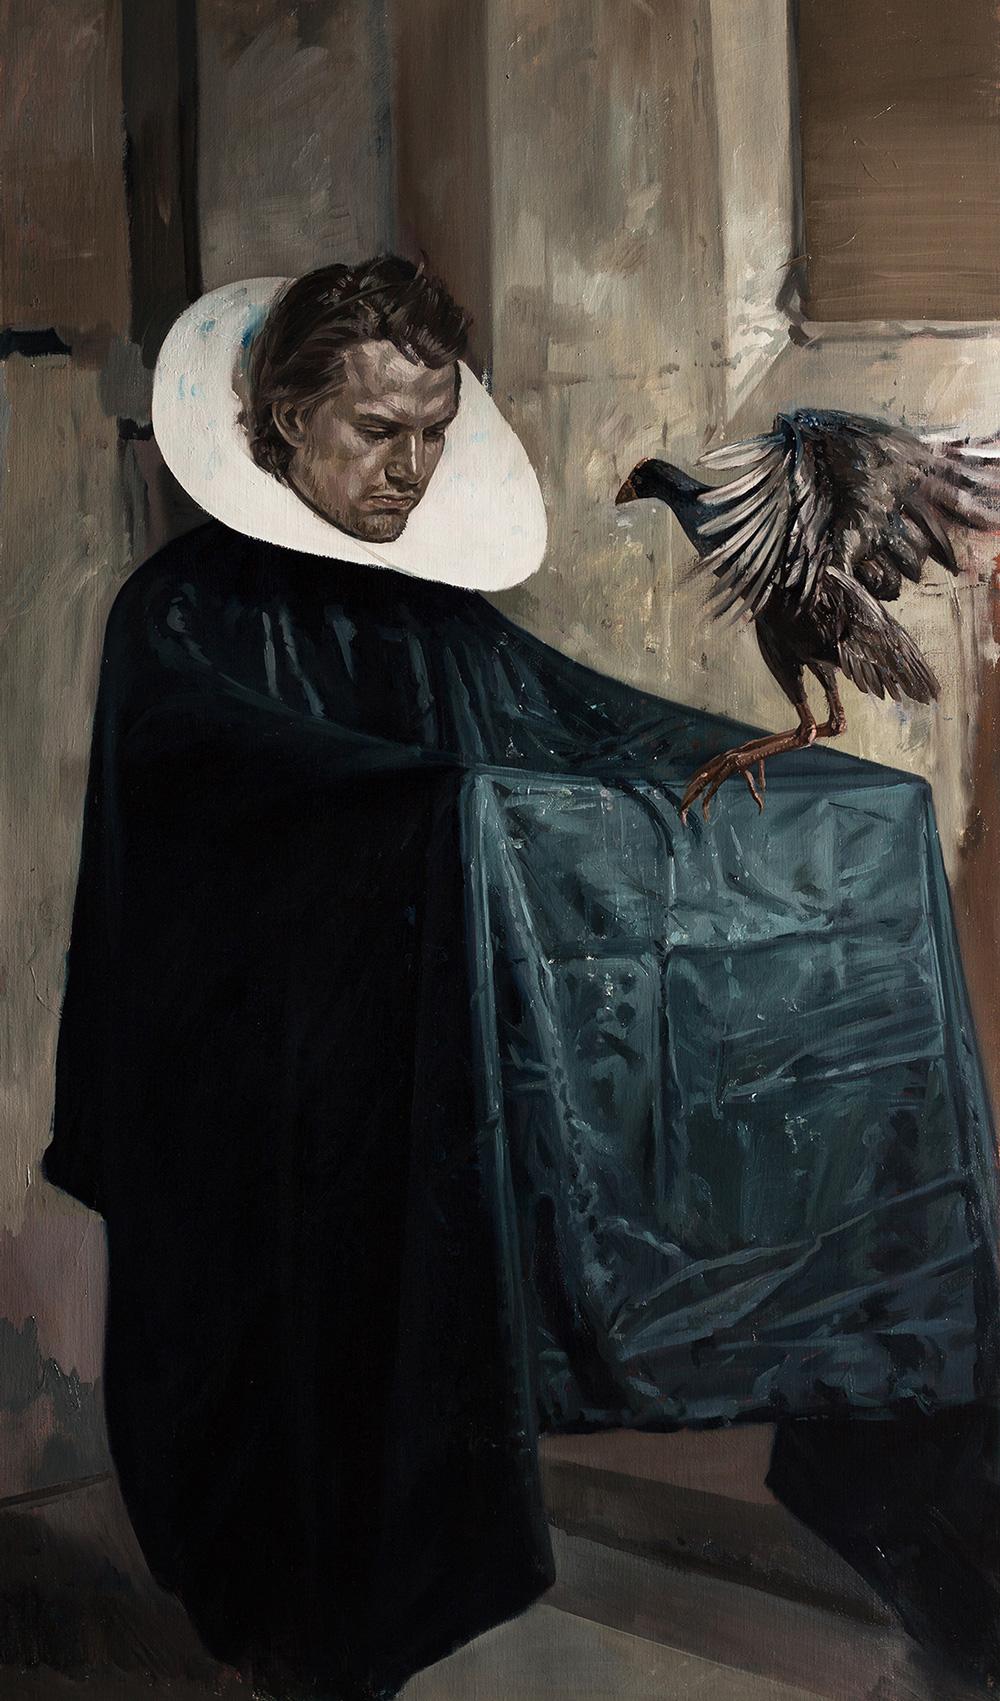 The magic 2, 2014, oil on linen, 128 x 75 cm